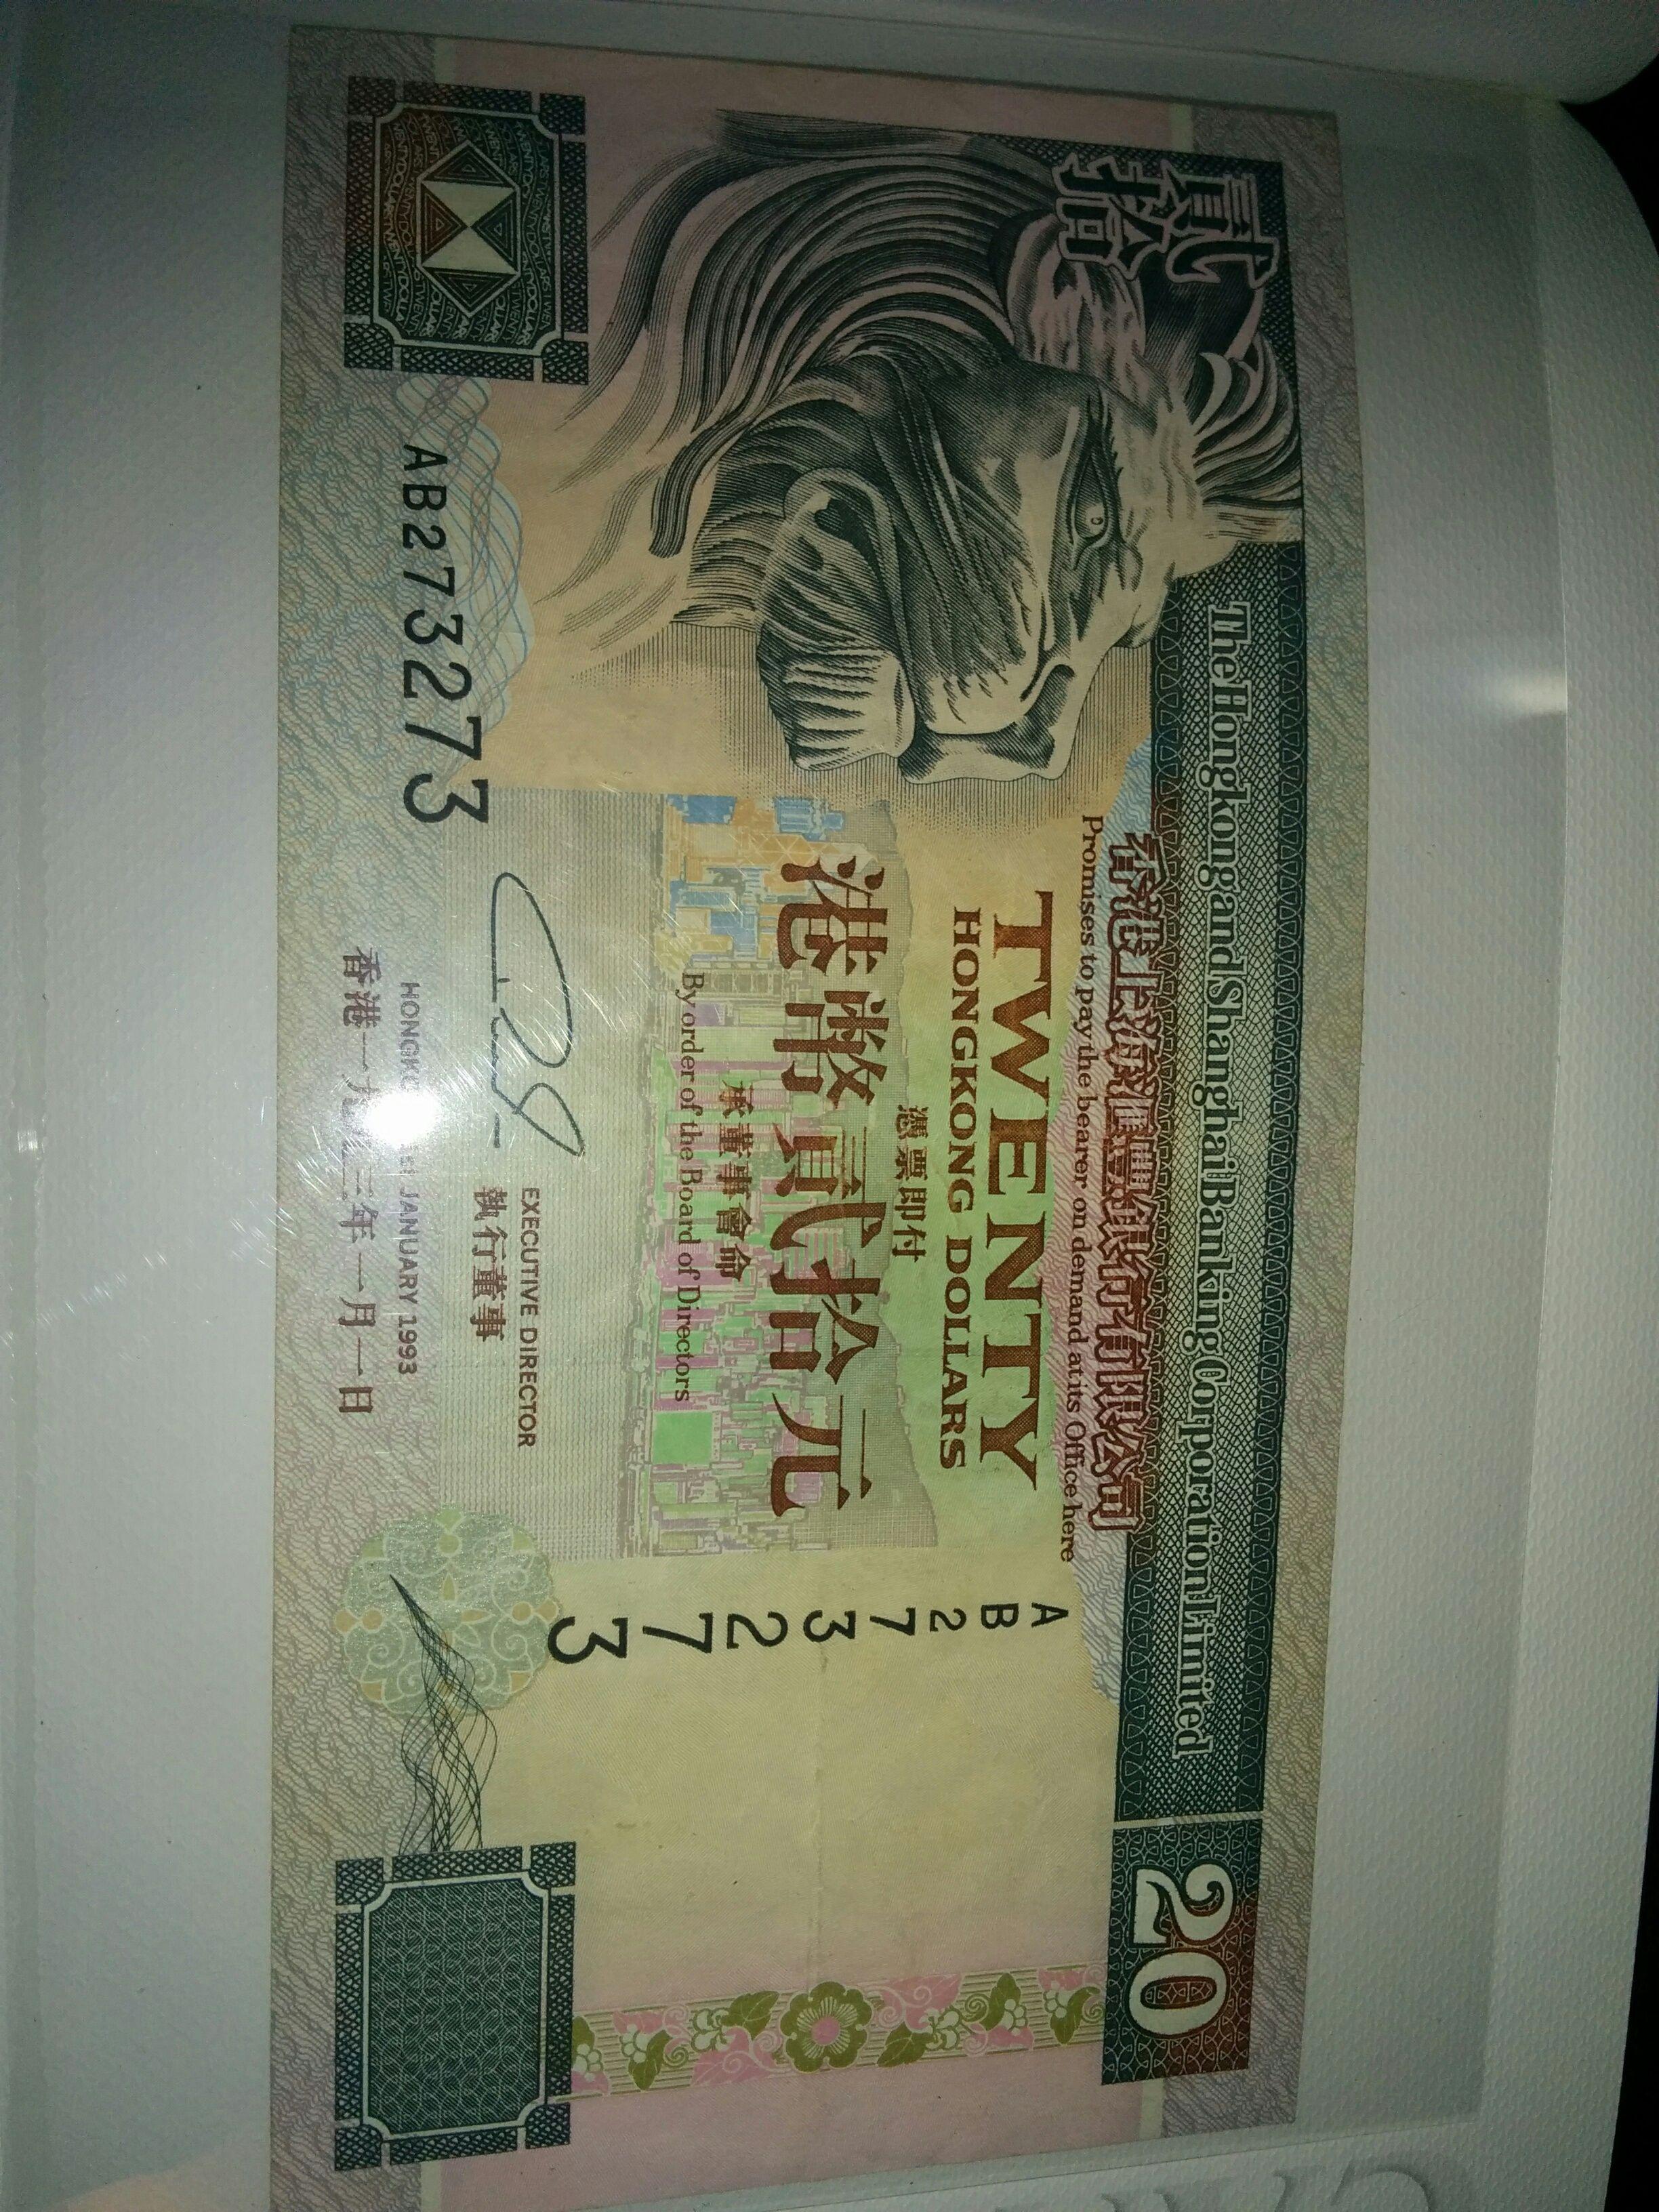 Hong Kong Bank Notes Collectible Sale Banner Ads Network